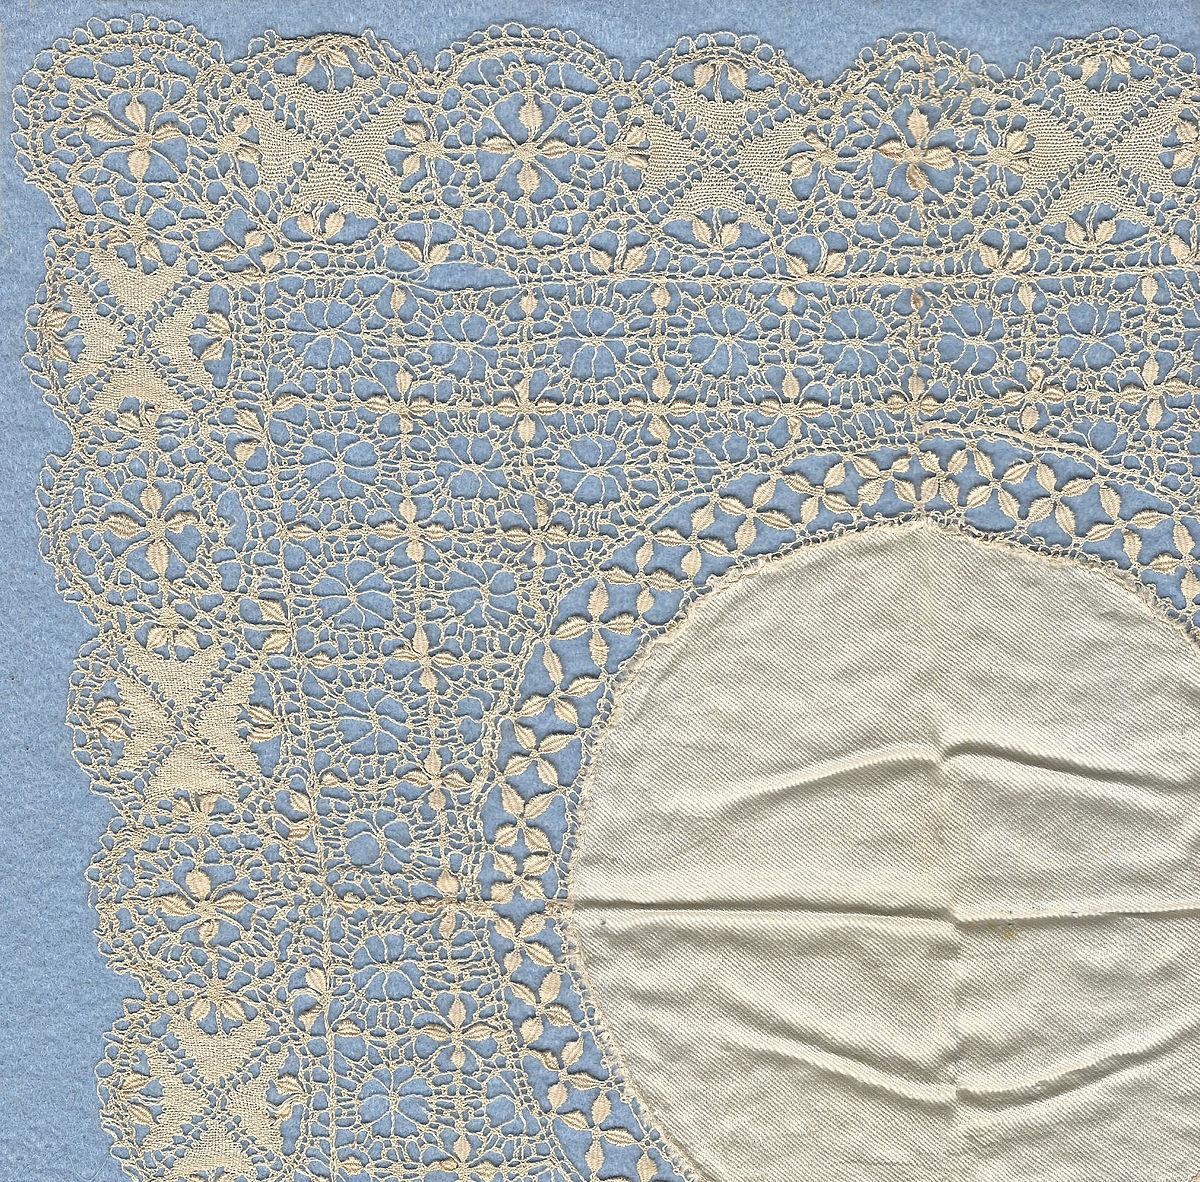 Maltese lace  Wikipedia